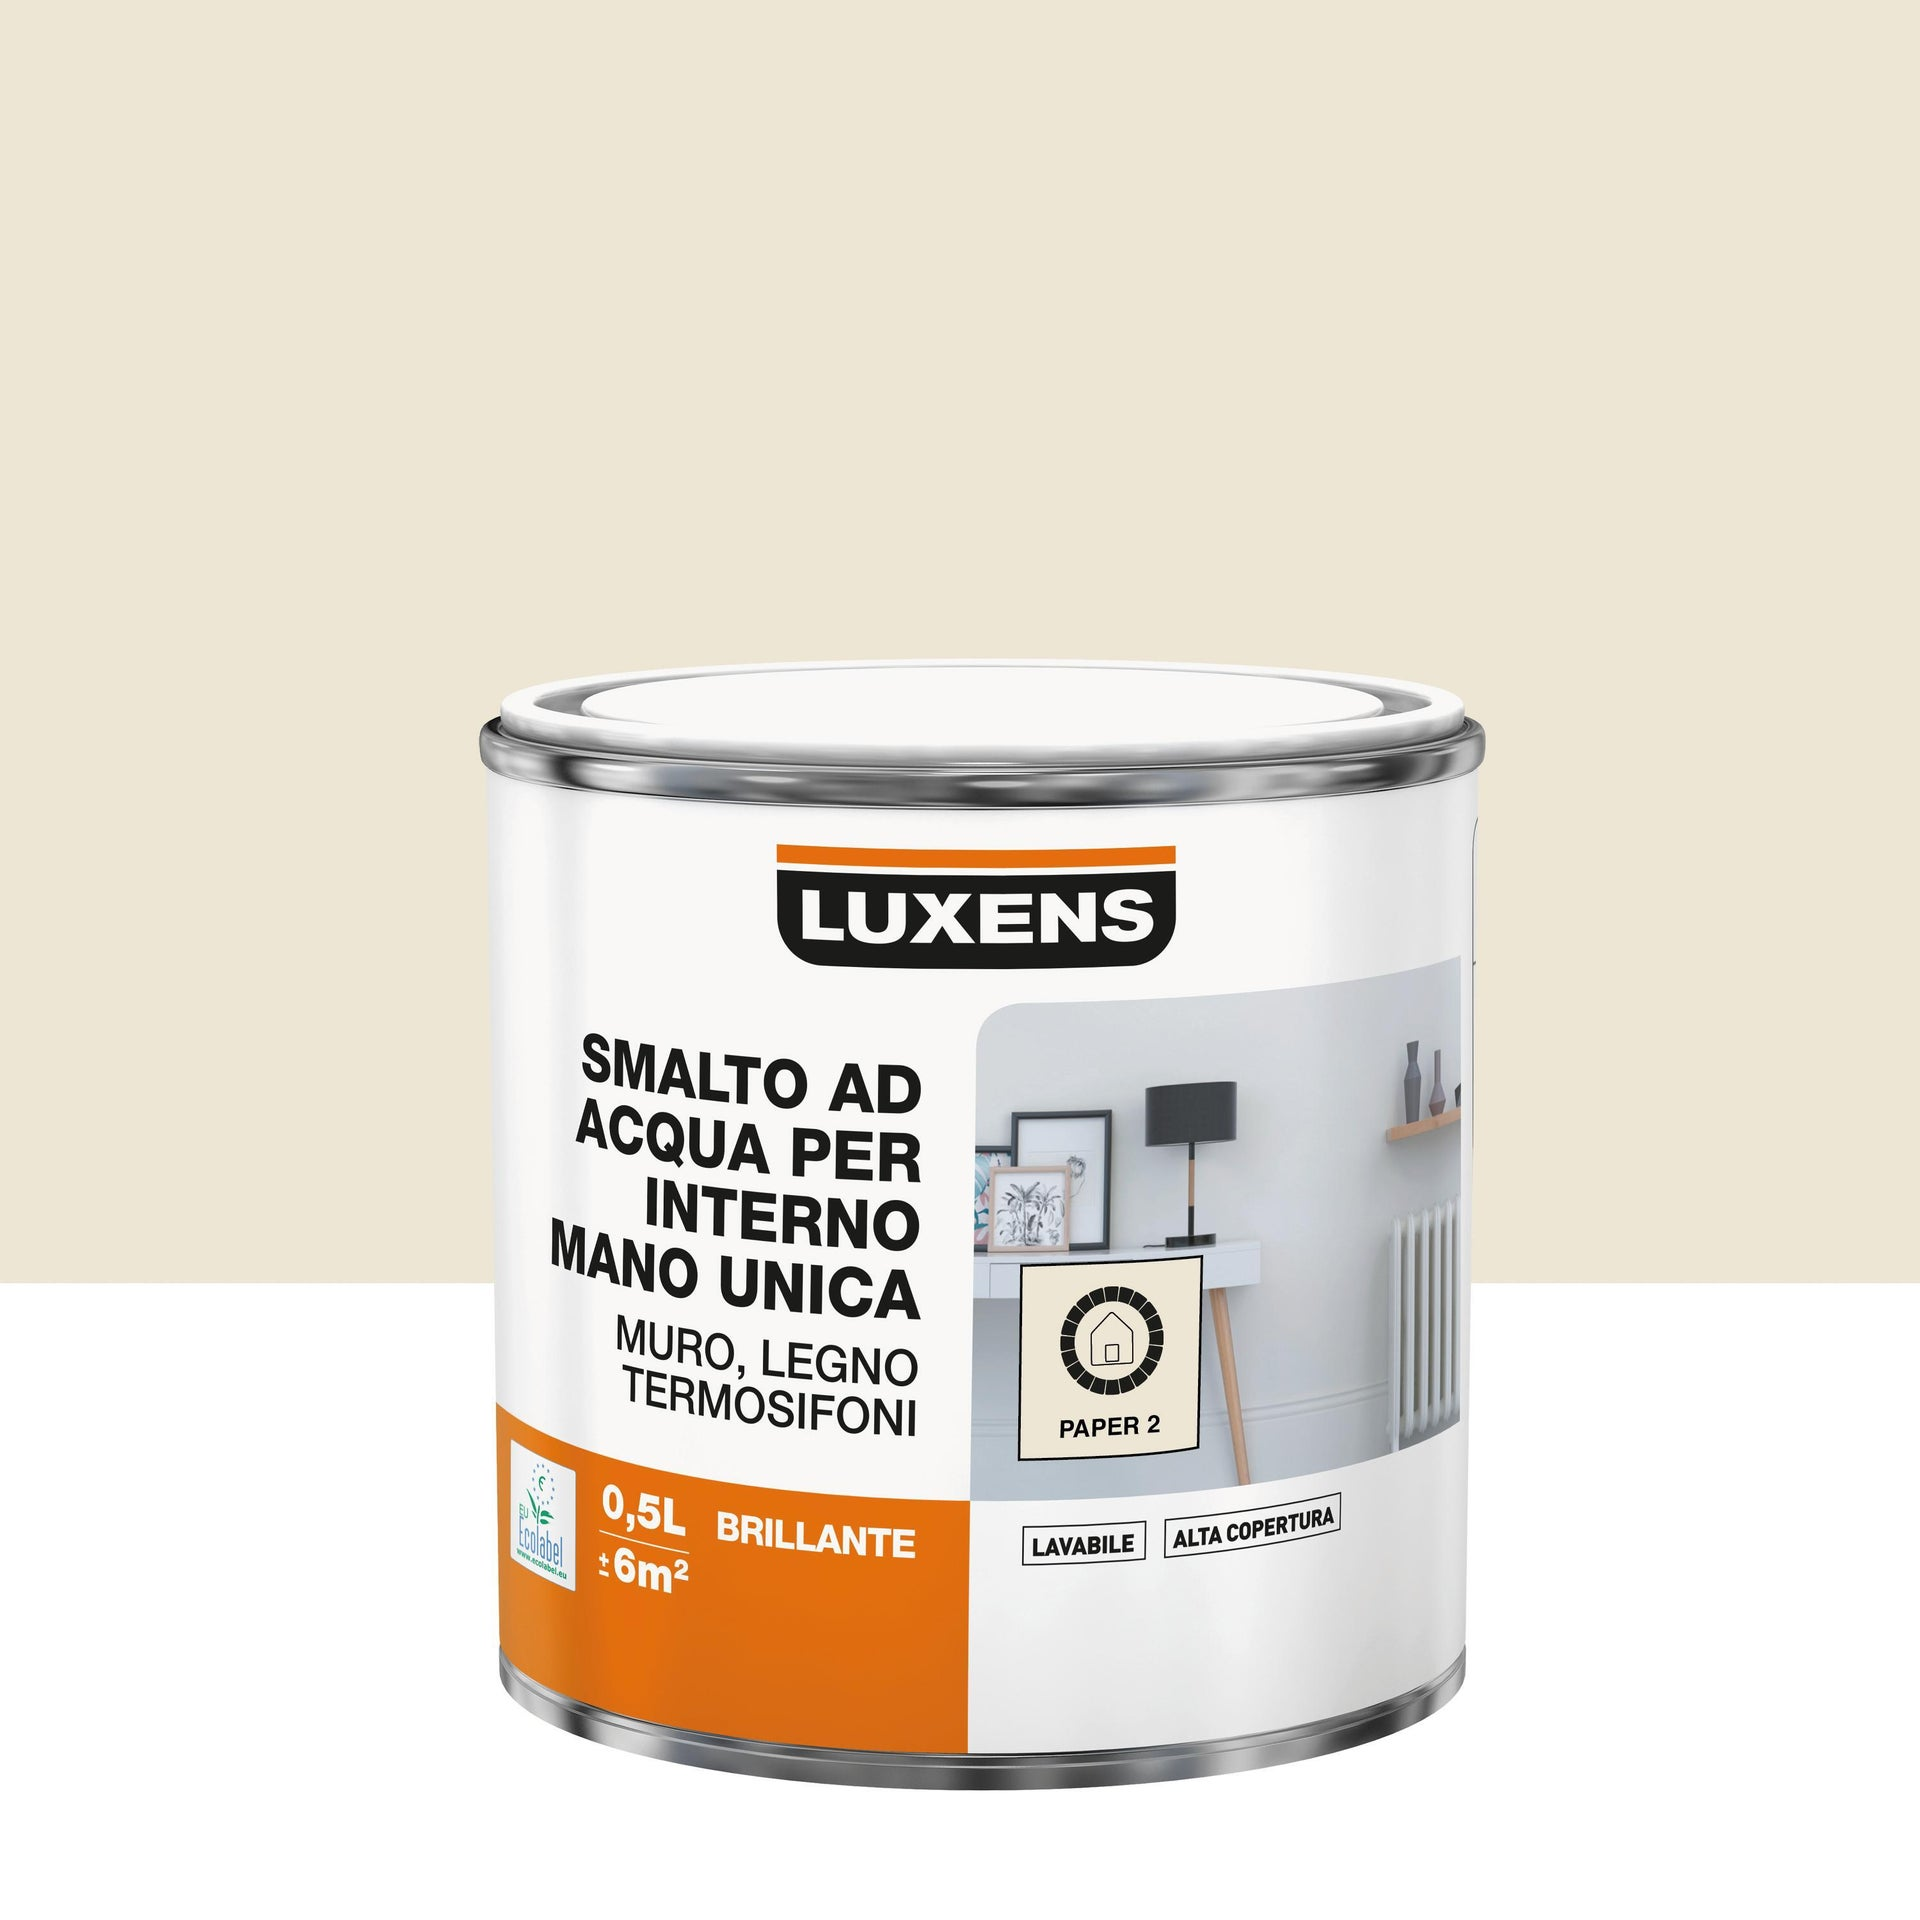 Vernice di finitura LUXENS Manounica base acqua bianco paper 2 lucido 0.5 L - 1